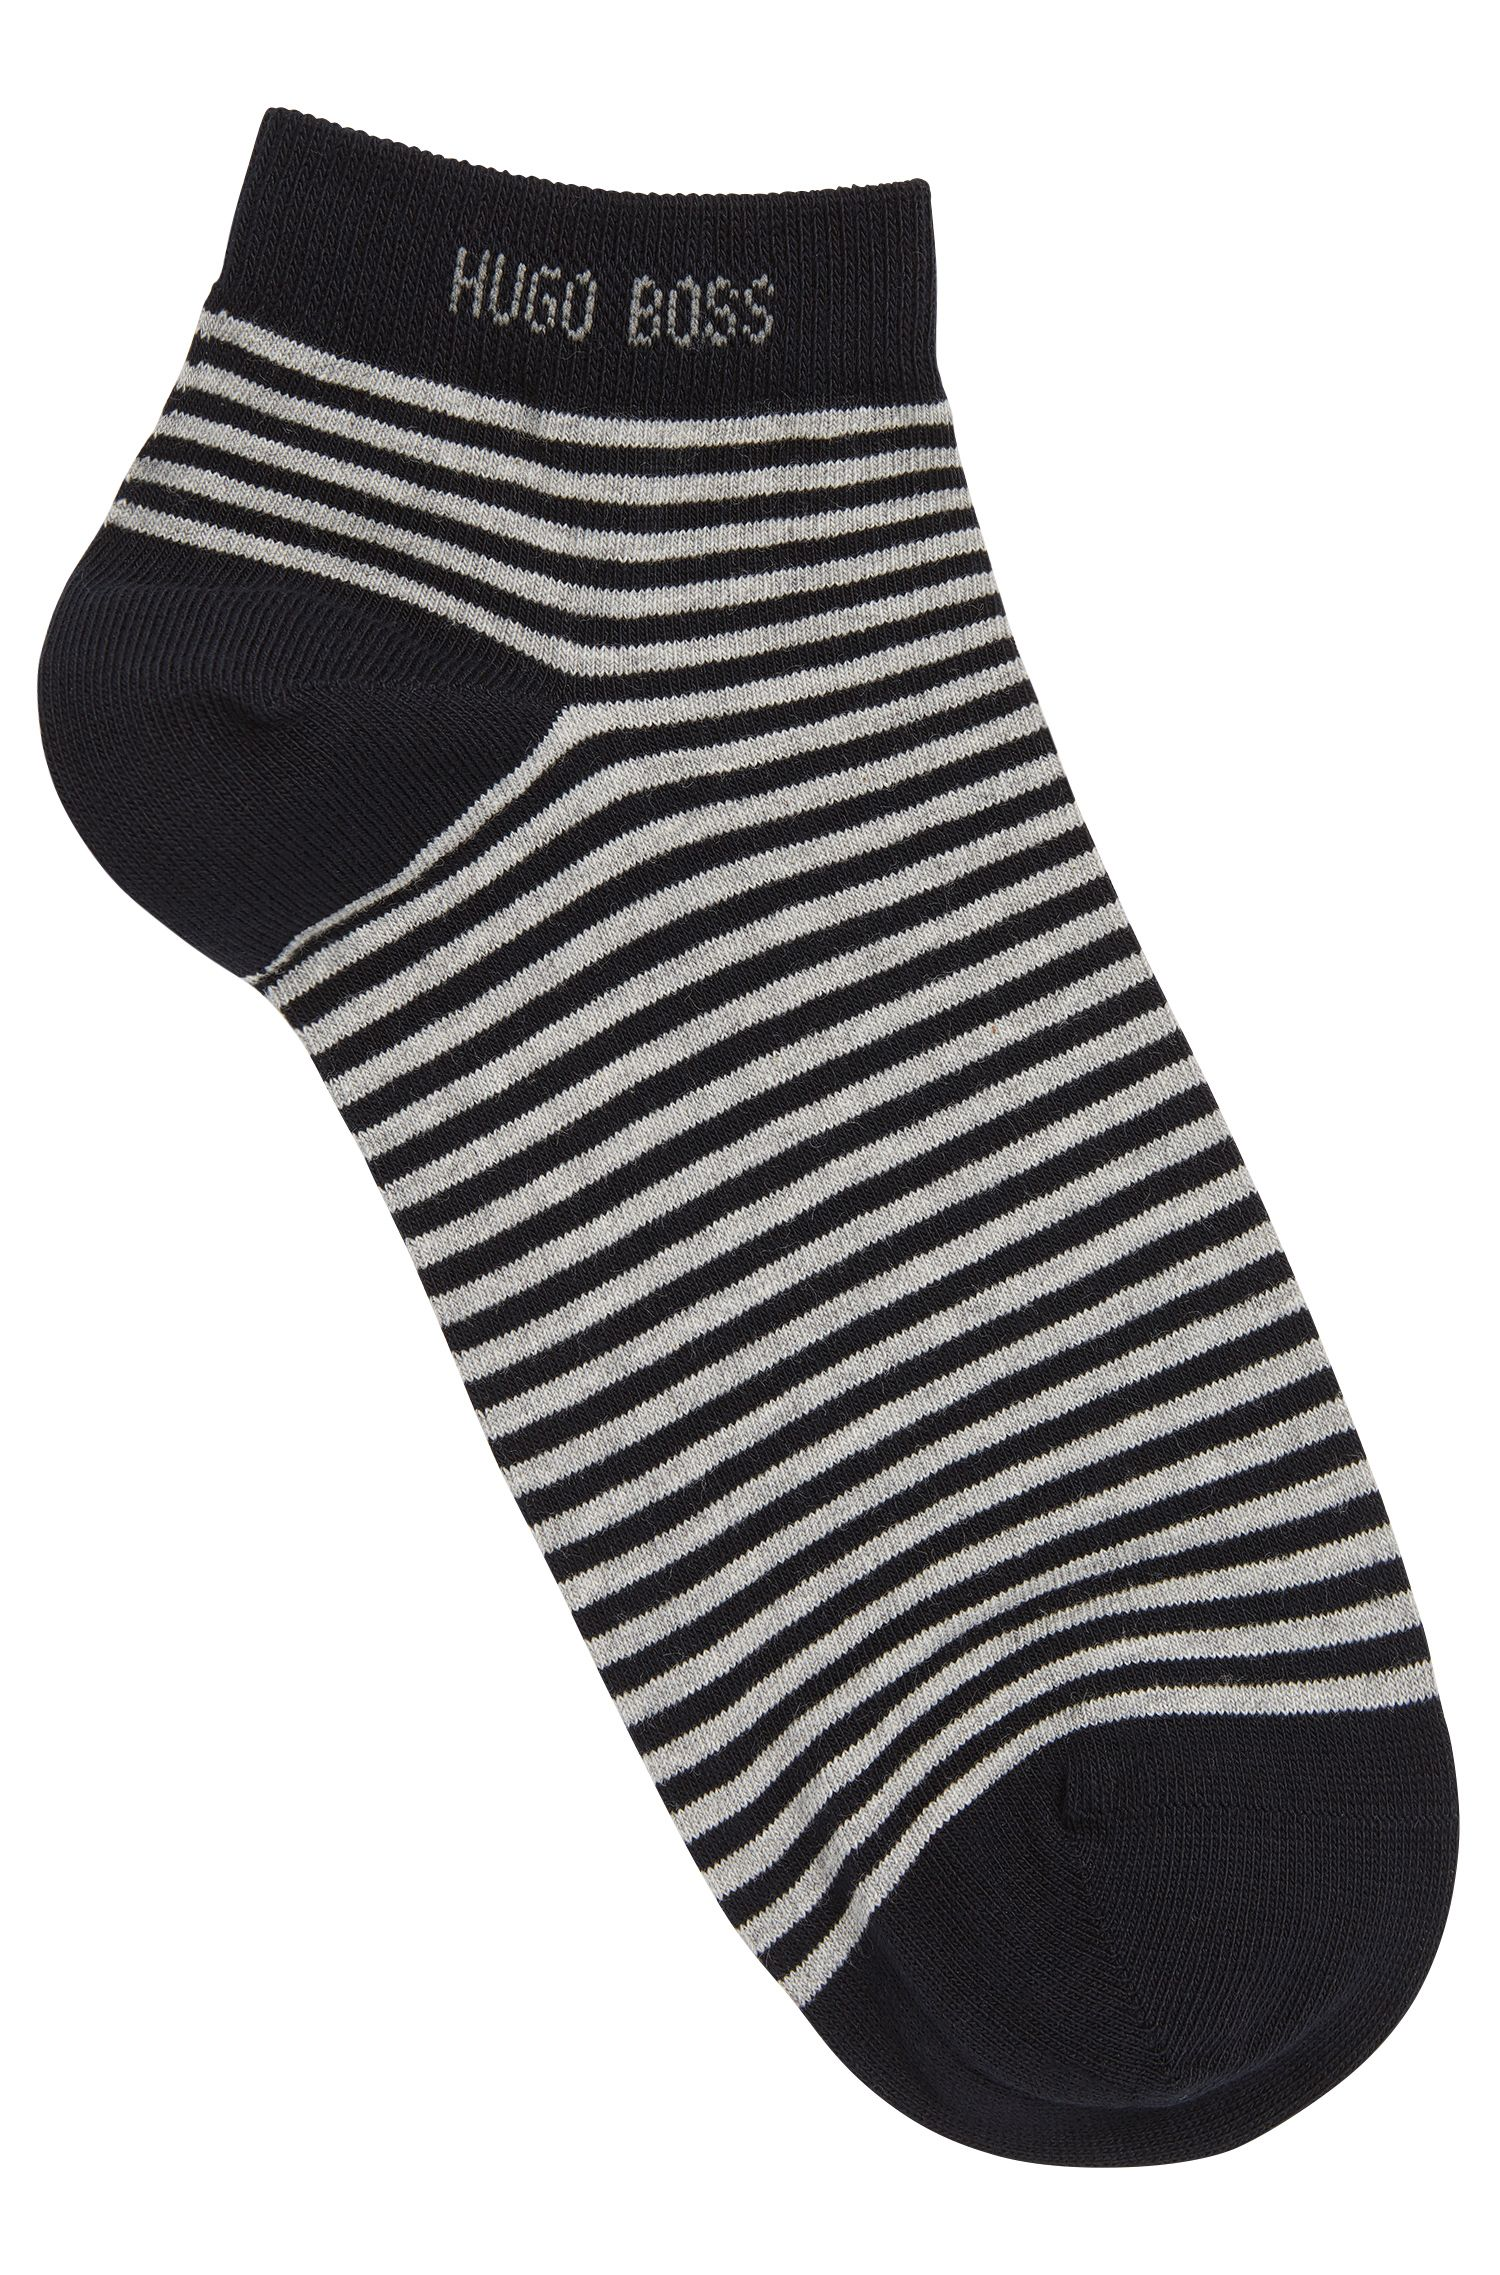 Gestreifte Sneaker-Socken aus elastischer Baumwolle: 'Marc'